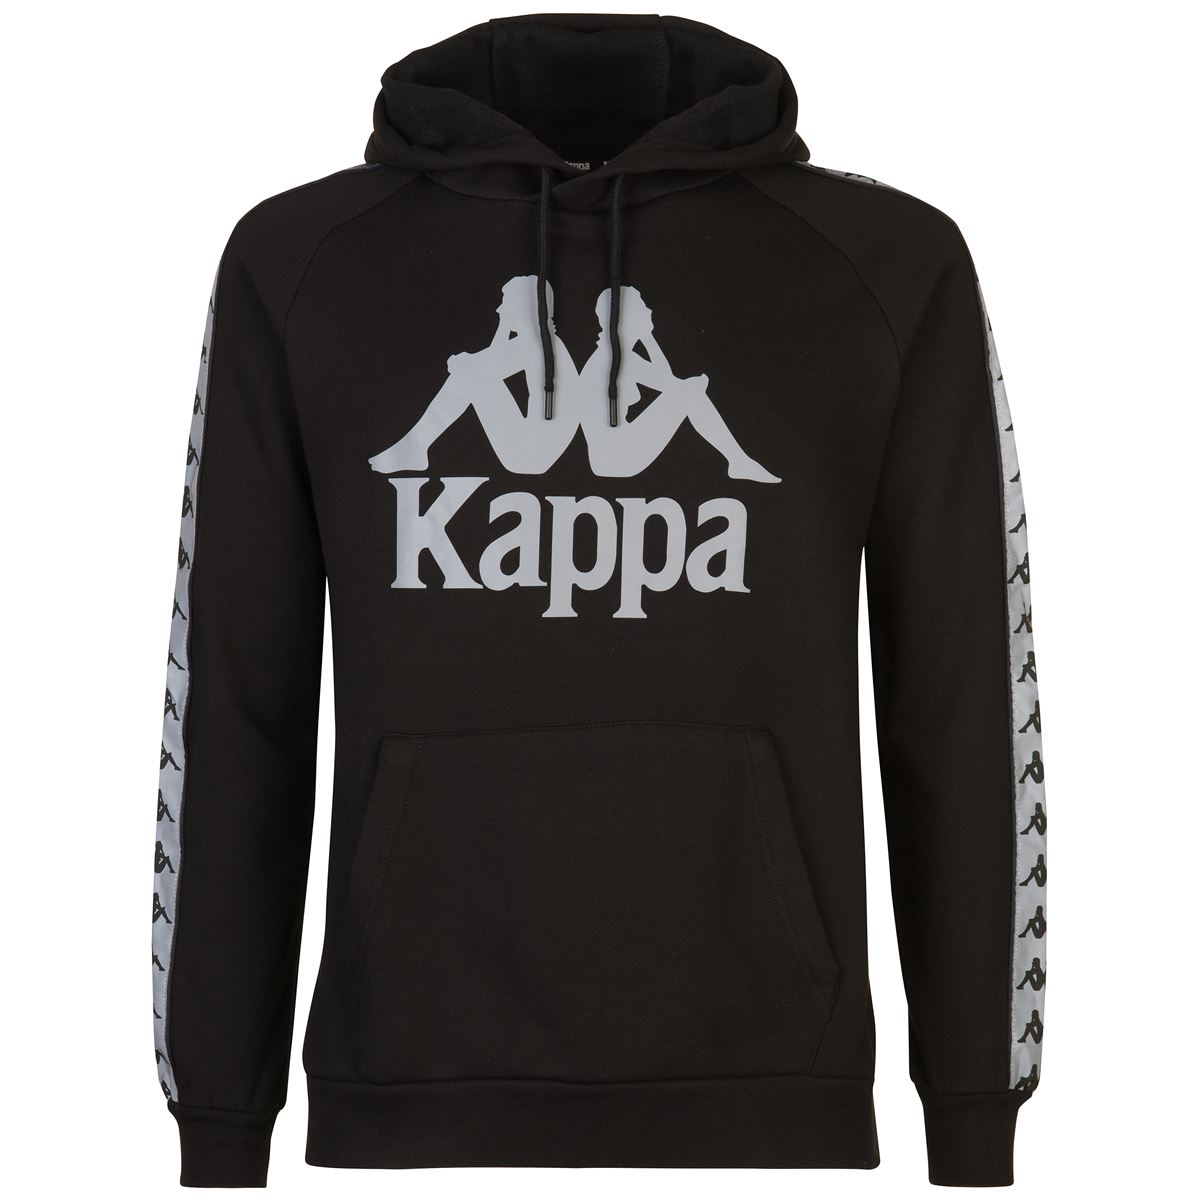 Felpa unisex con cappuccio in felpa garzata Kappa | Felpa | 3116NXWA09 BLACK-SILVER